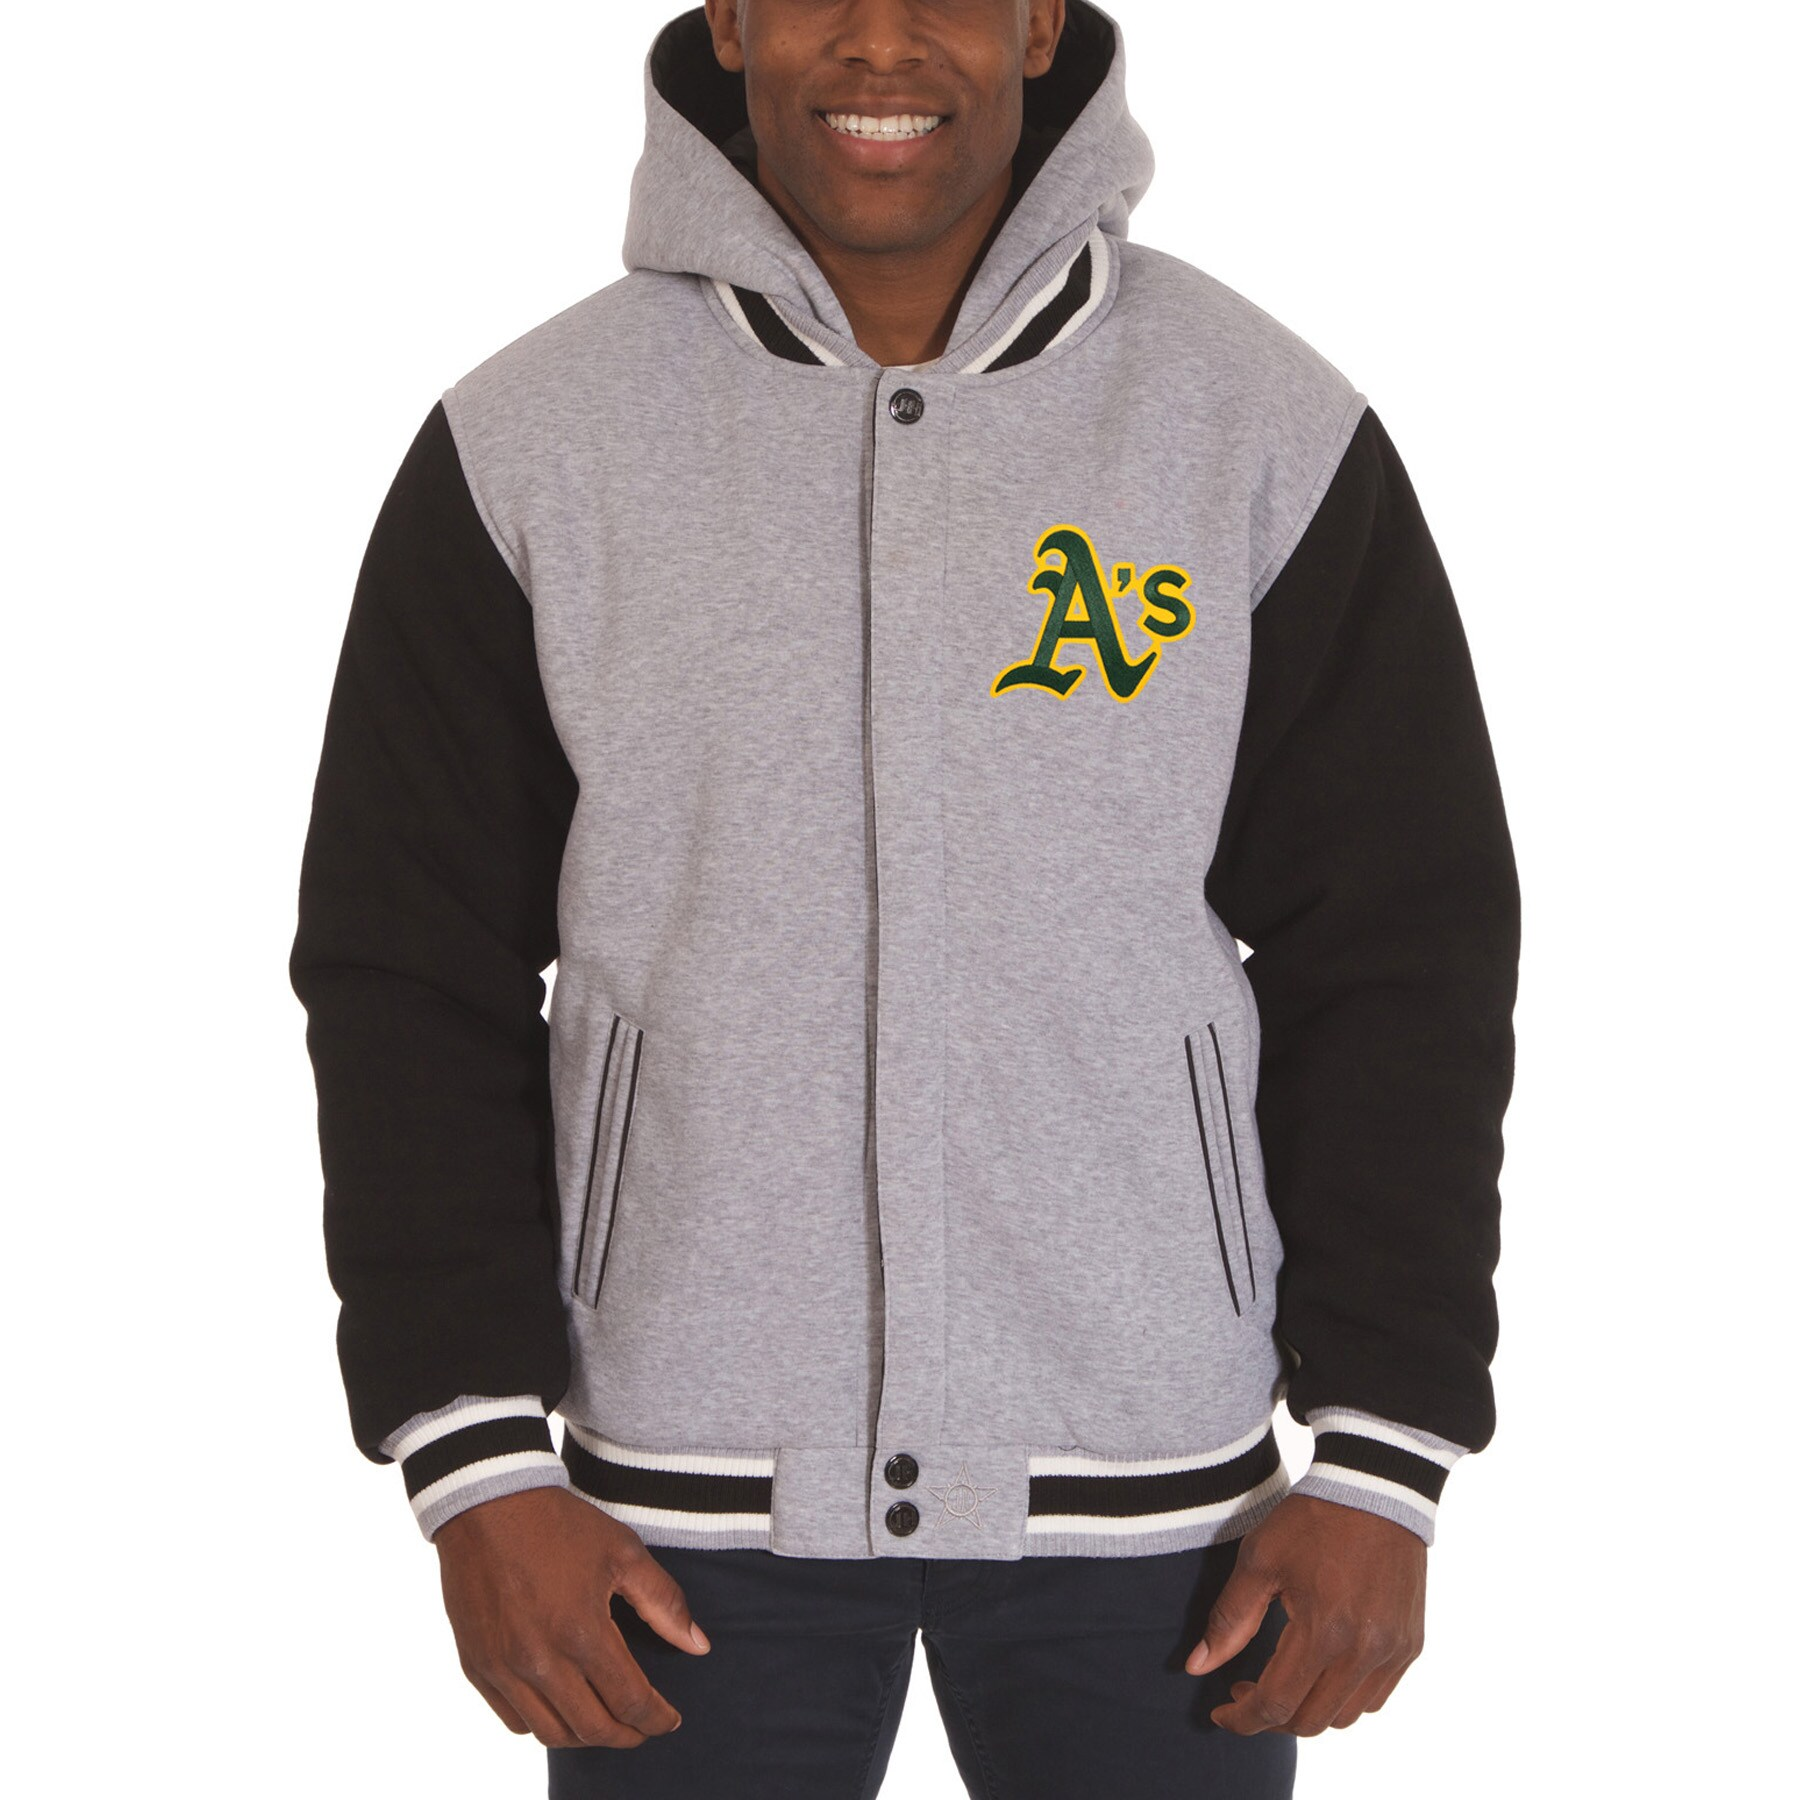 Oakland Athletics JH Design Reversible Fleece Full Snap Hoodie - Gray